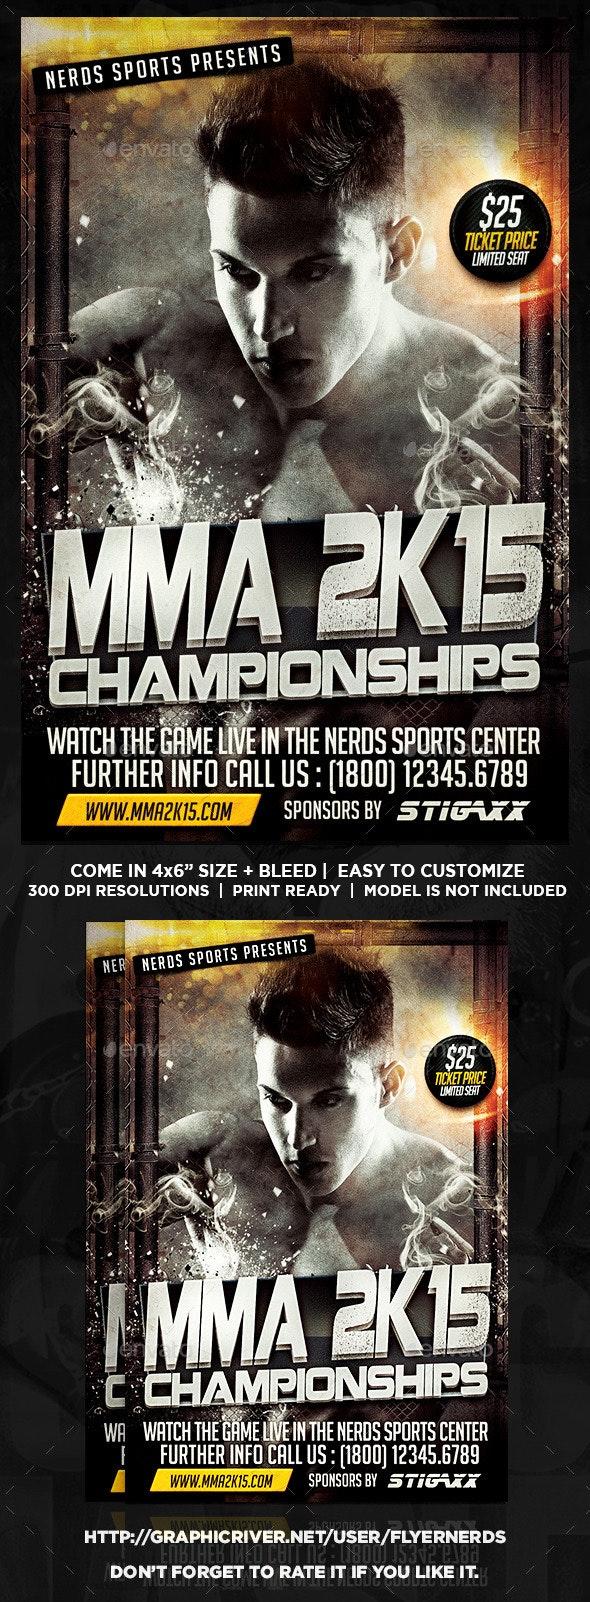 MMA 2K15 Championships Sports Flyer - Sports Events